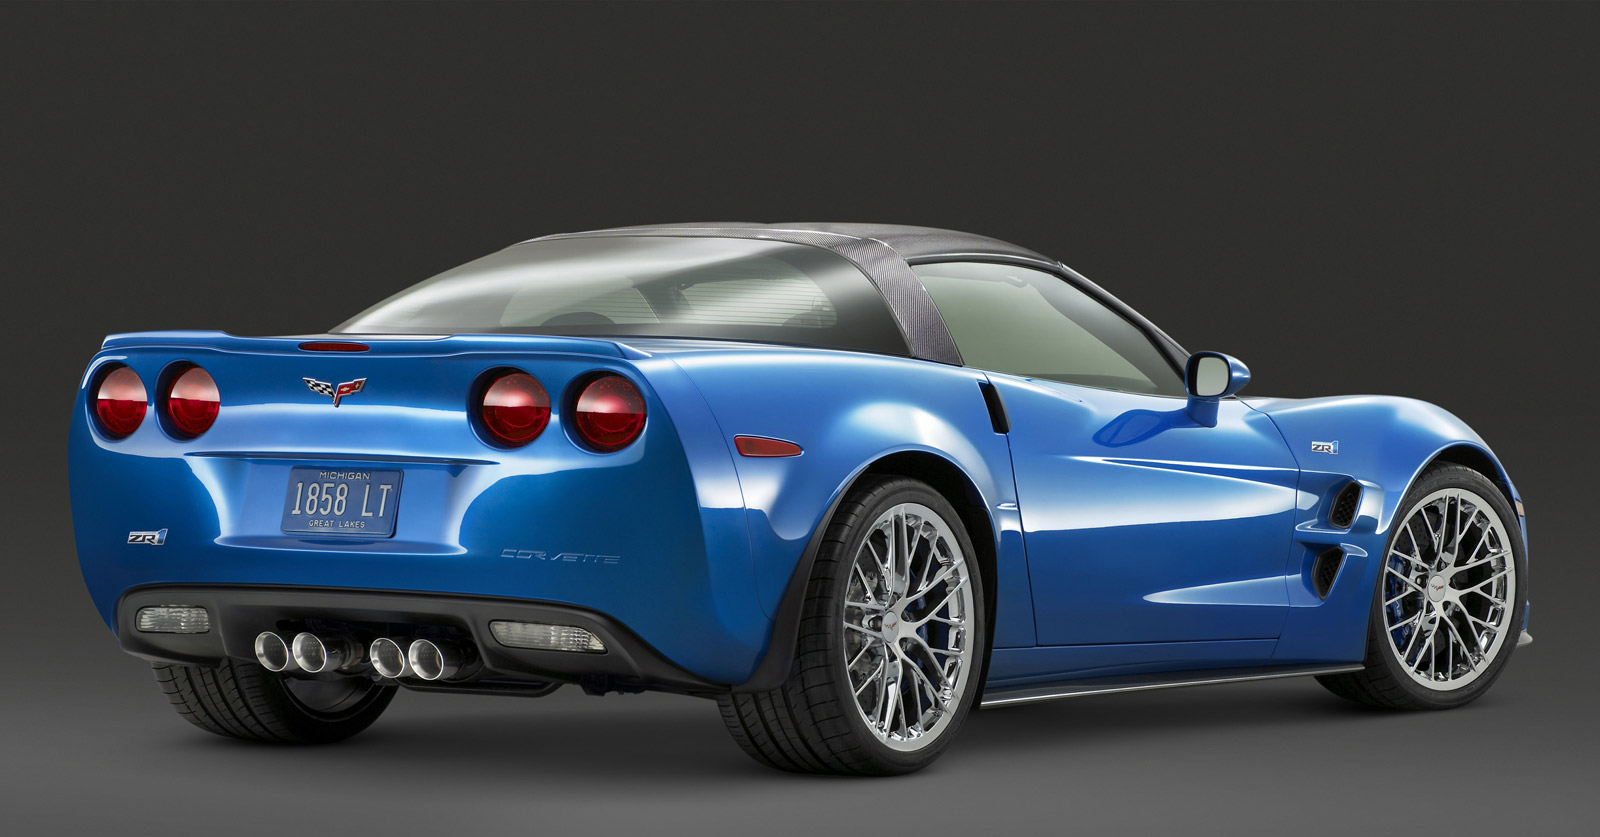 New Details On Rumored Mid-Engine ZR1, C8 Corvette